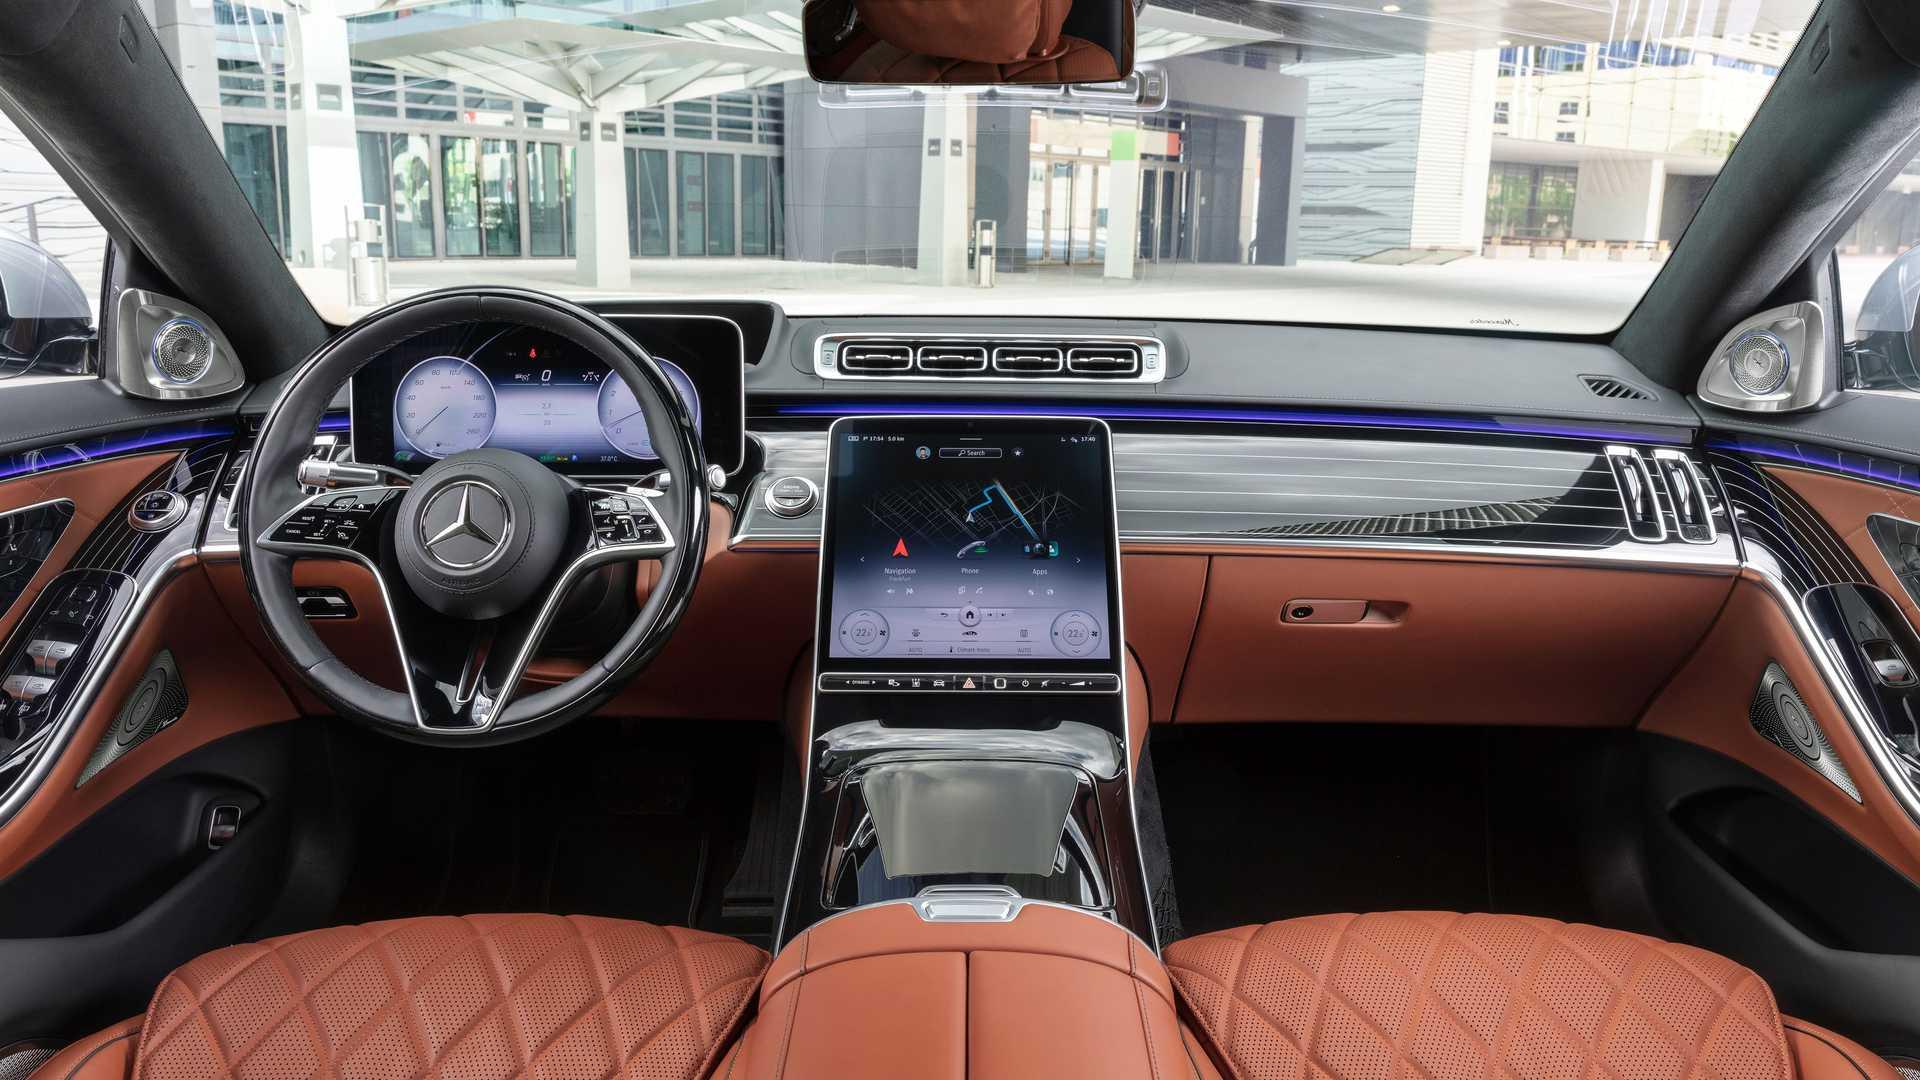 2021-mercedes-benz-s-class-interior